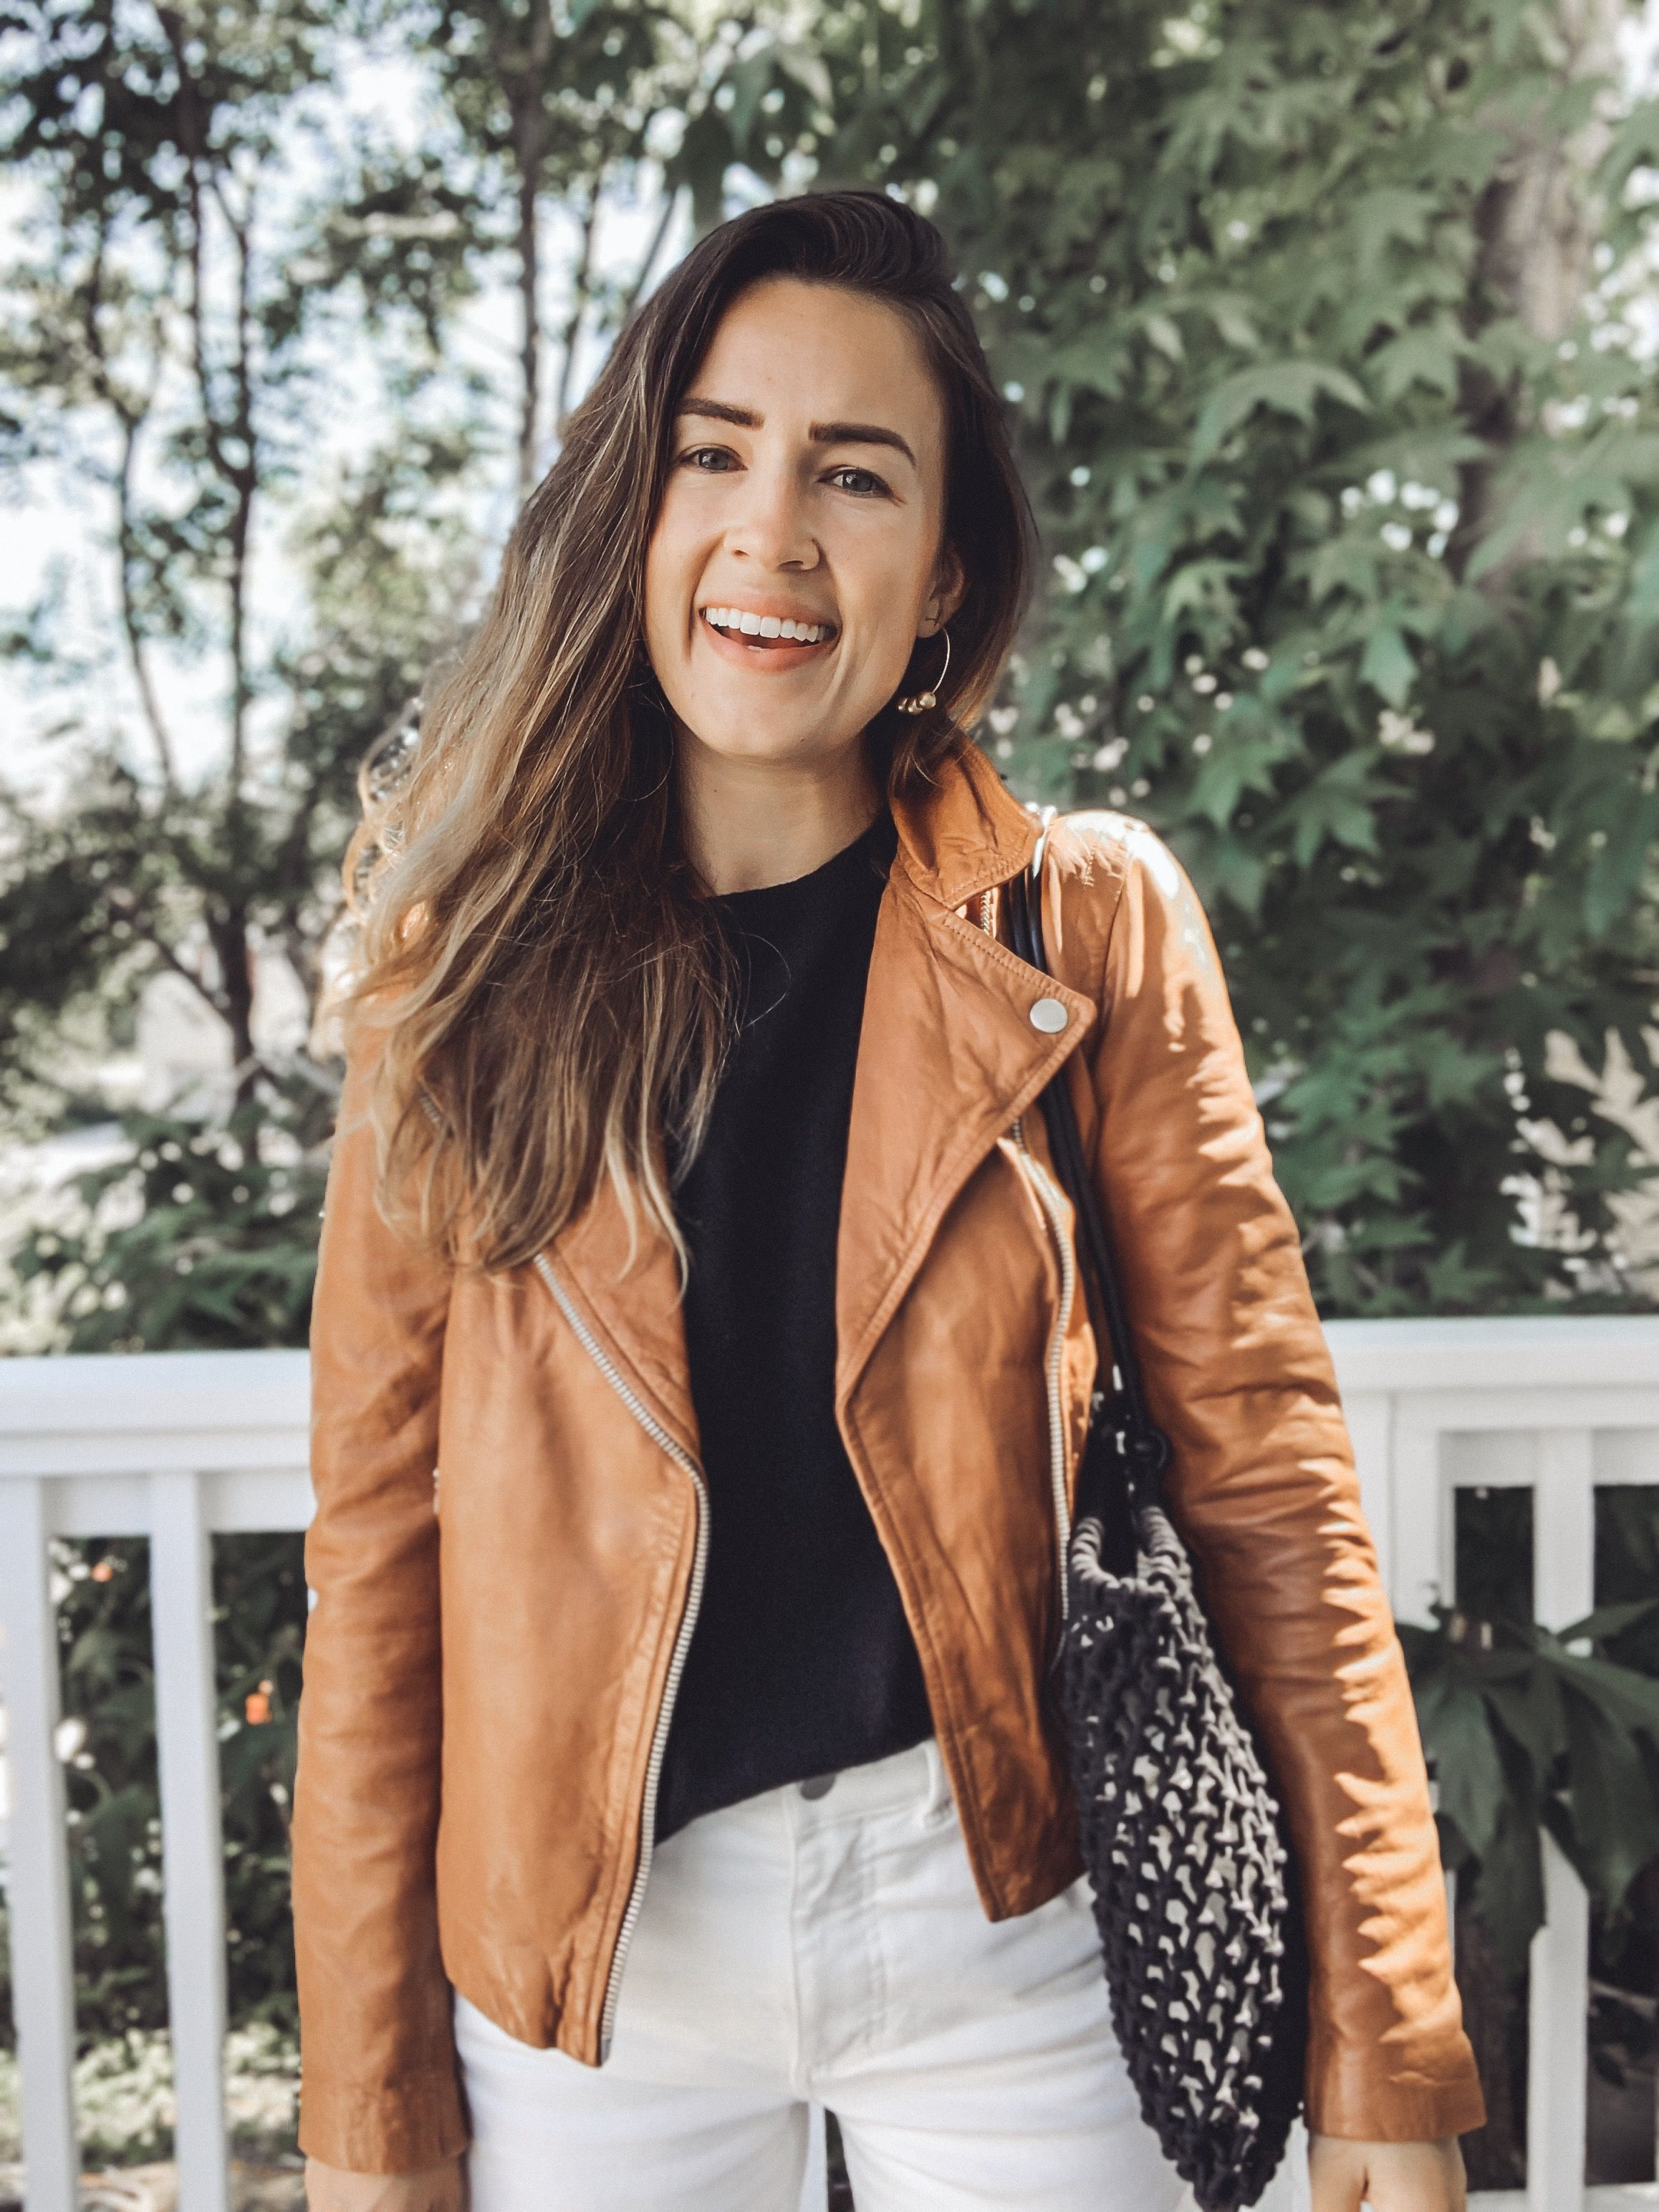 5 Ways To Wear A Tan Leather Jacket Natalie Borton Blog Tan Leather Jackets Coloured Leather Jacket Tan Leather Jacket Outfit [ 3088 x 2316 Pixel ]